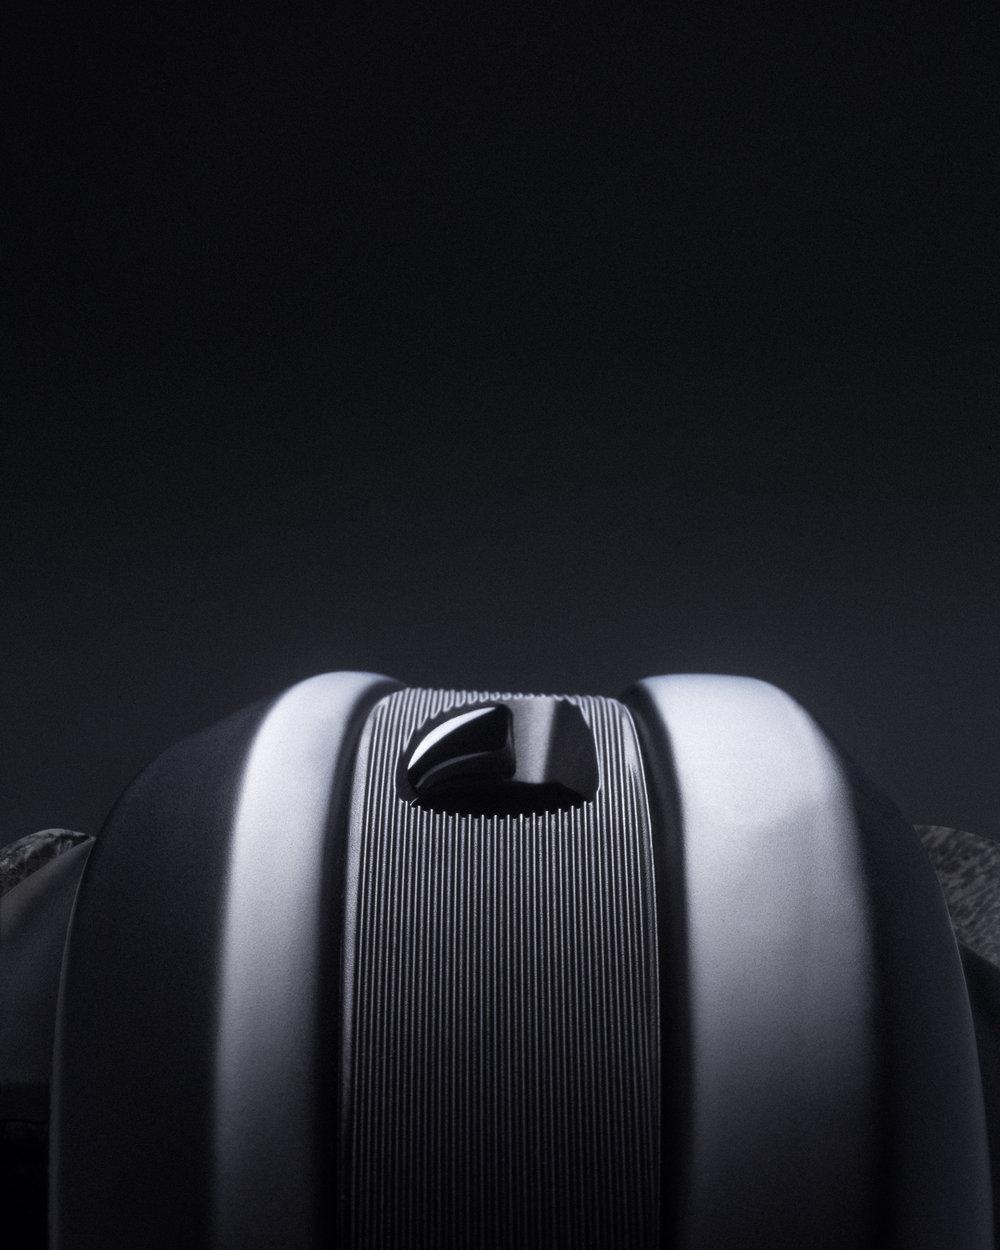 Rapha-Helmet-4341.jpg